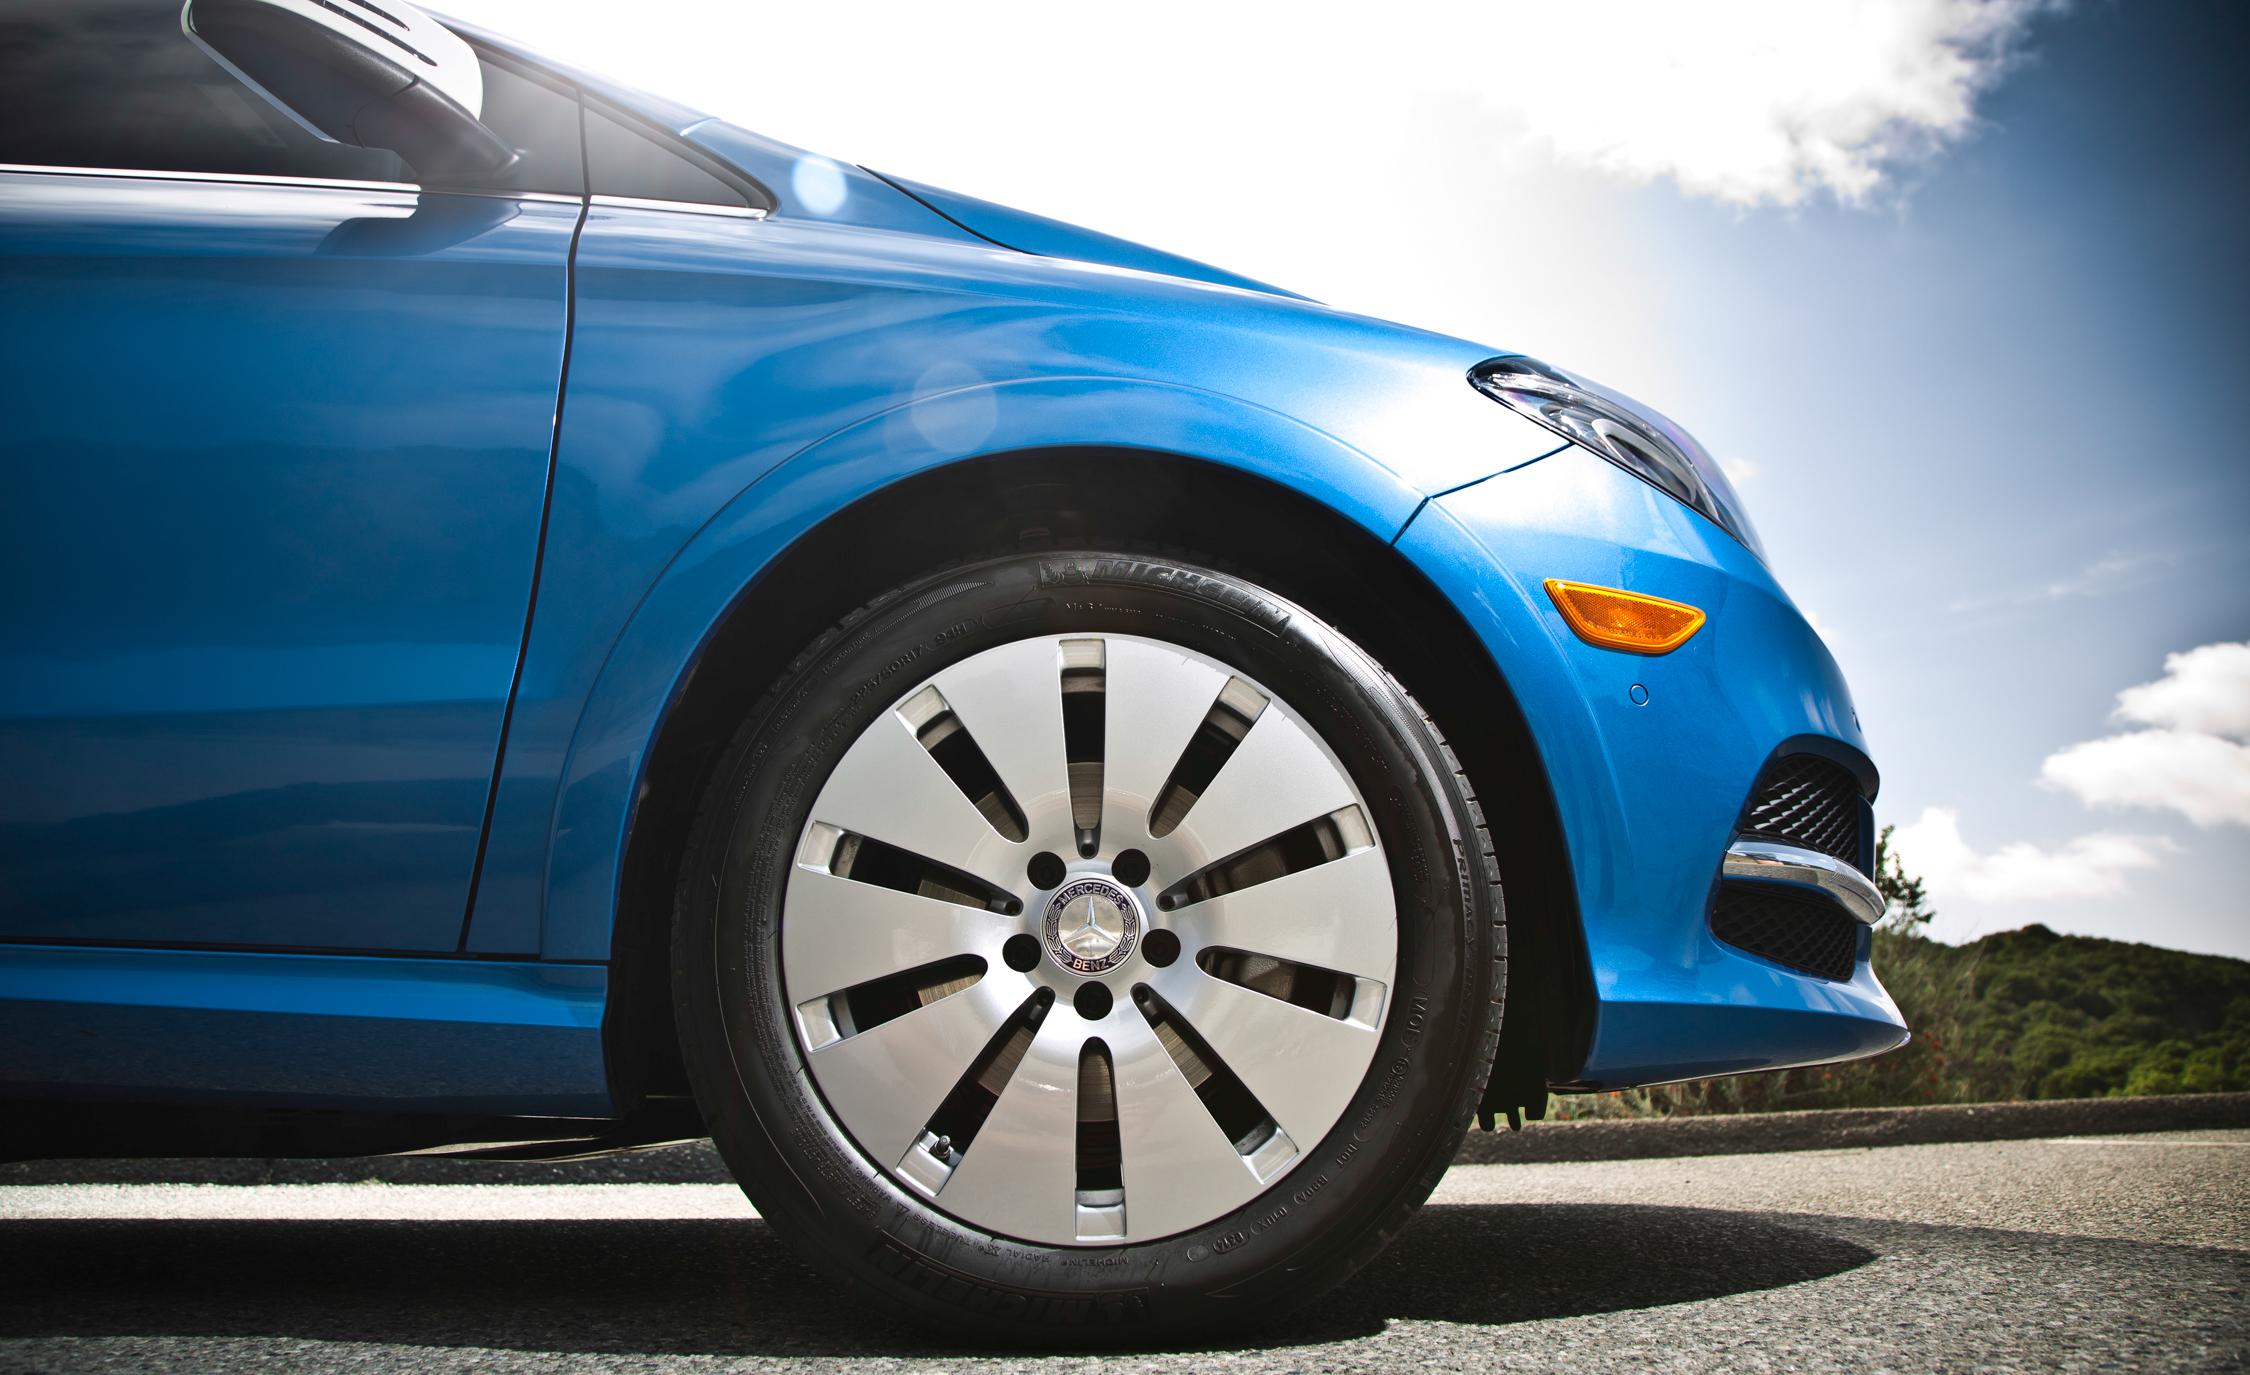 2014 Mercedes-Benz B-class Electric Drive Exterior Wheel